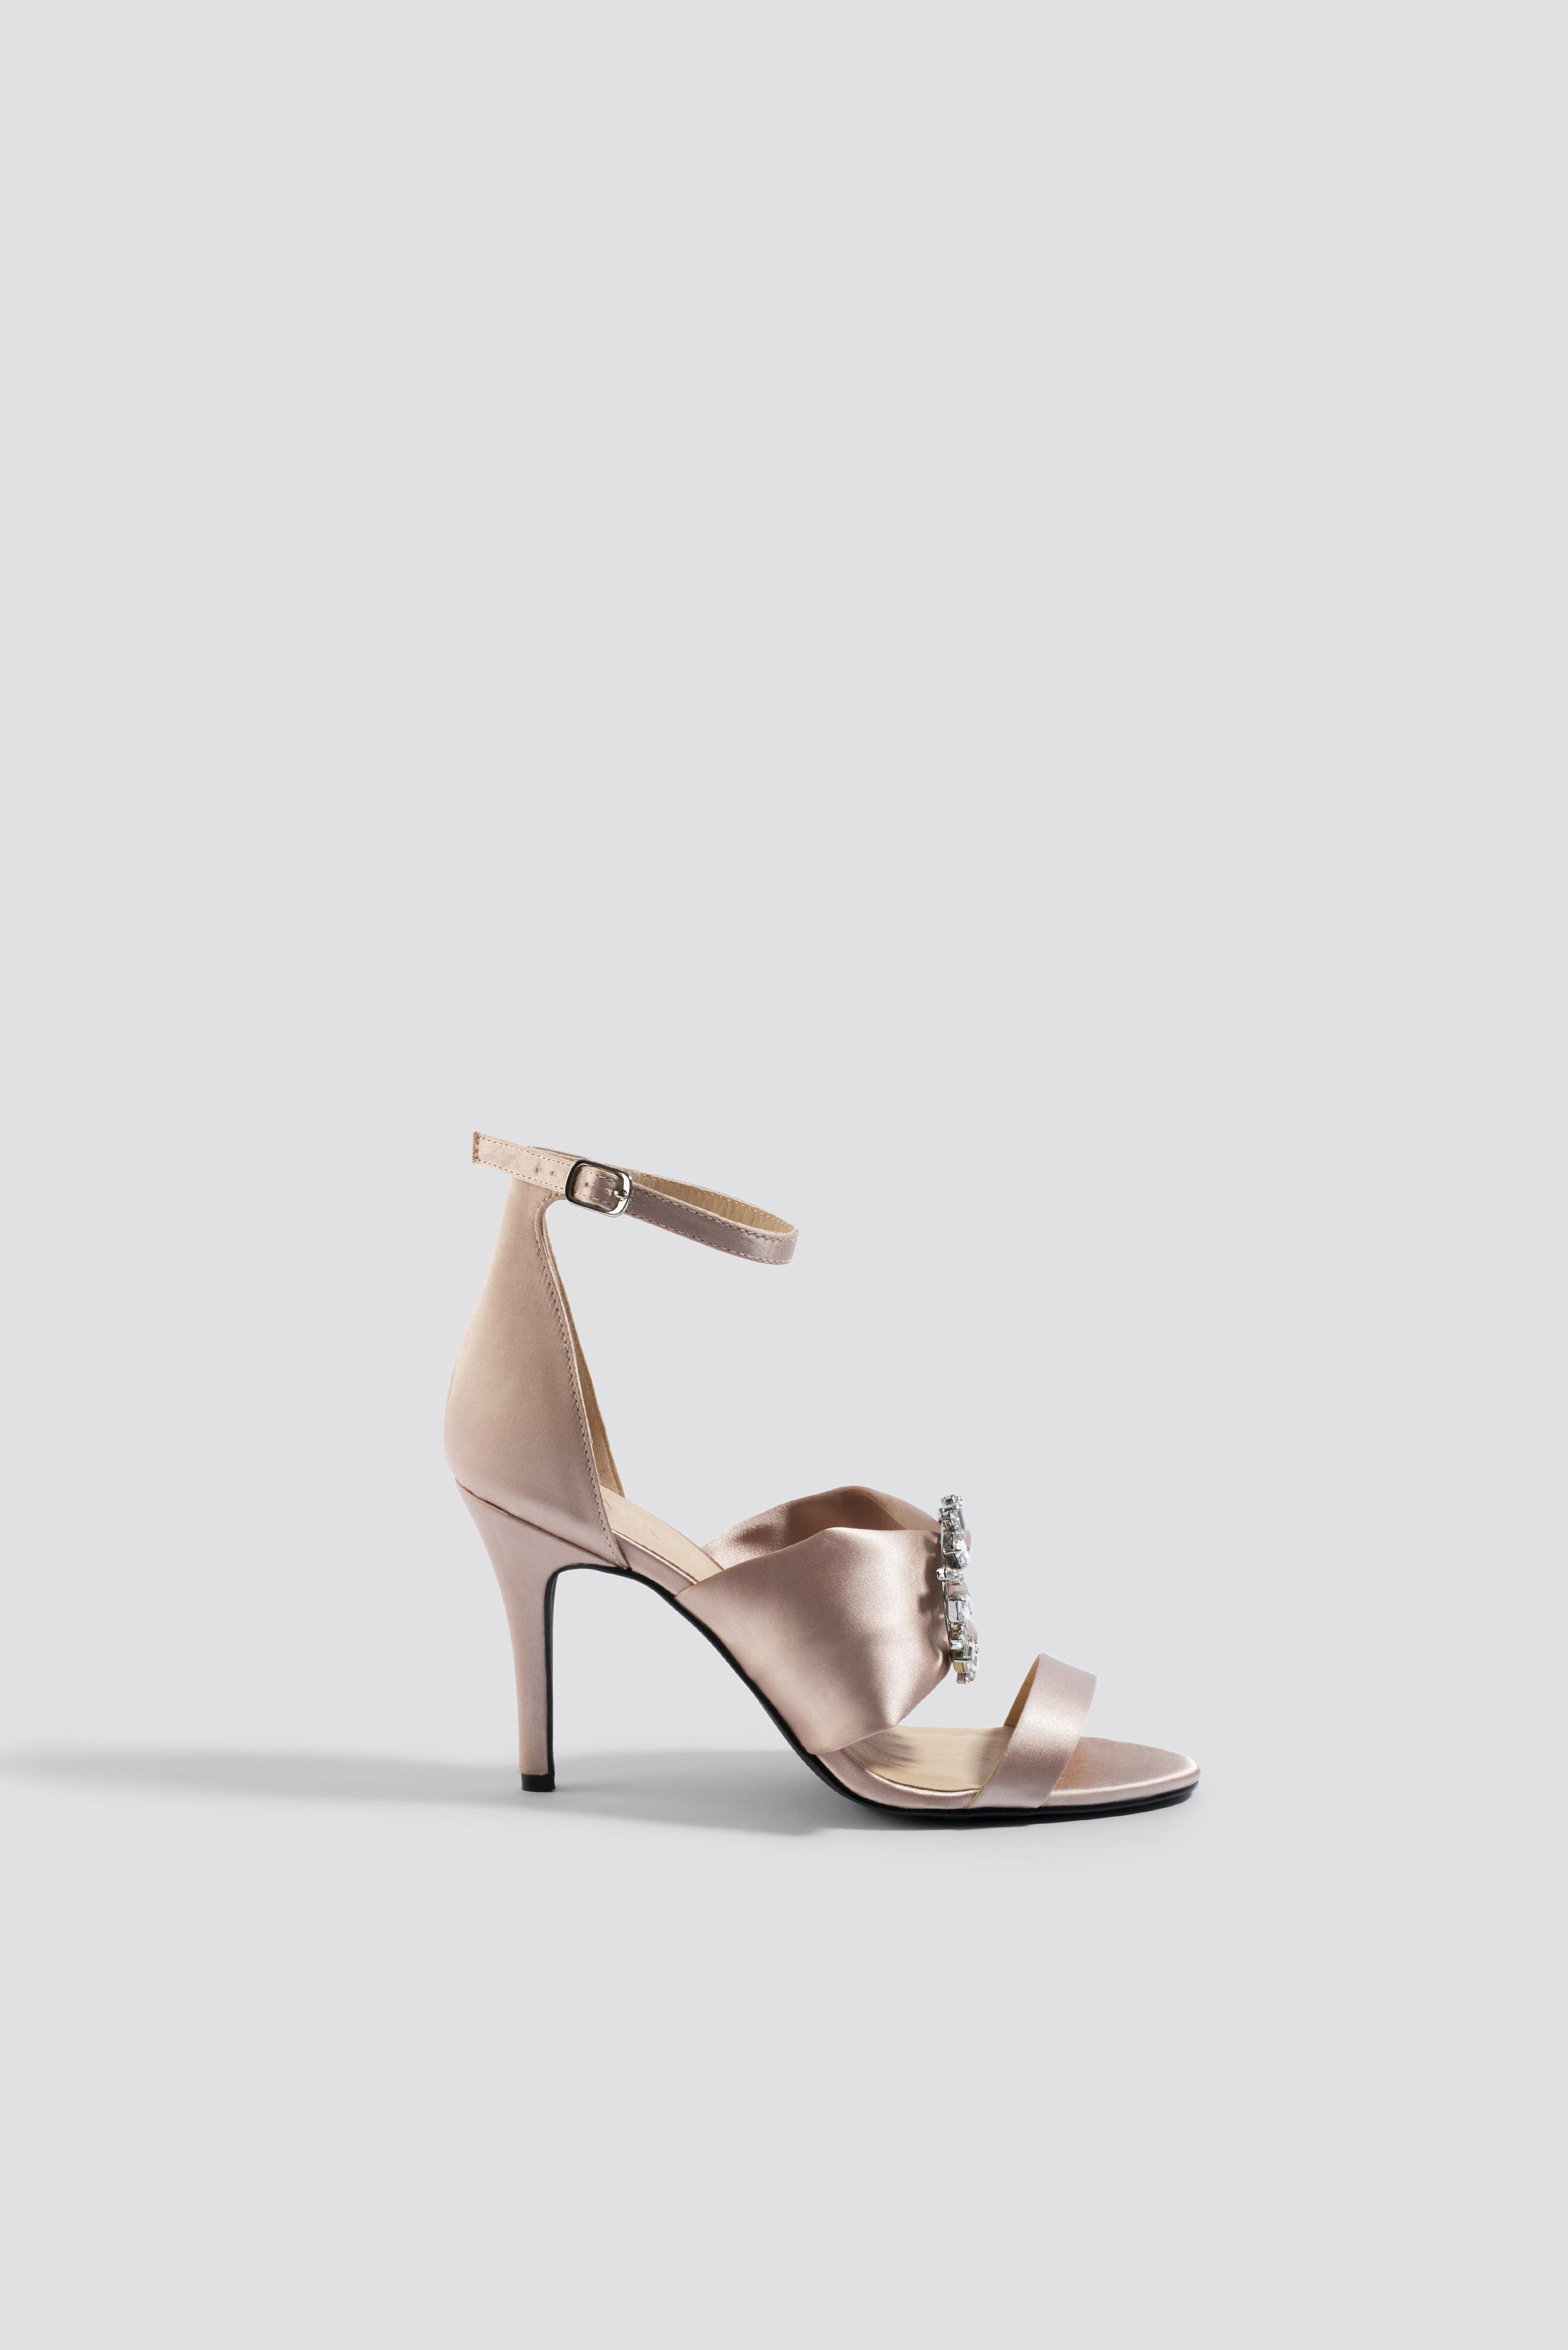 Jewel Detail High Heel Sandals NA-KD.COM